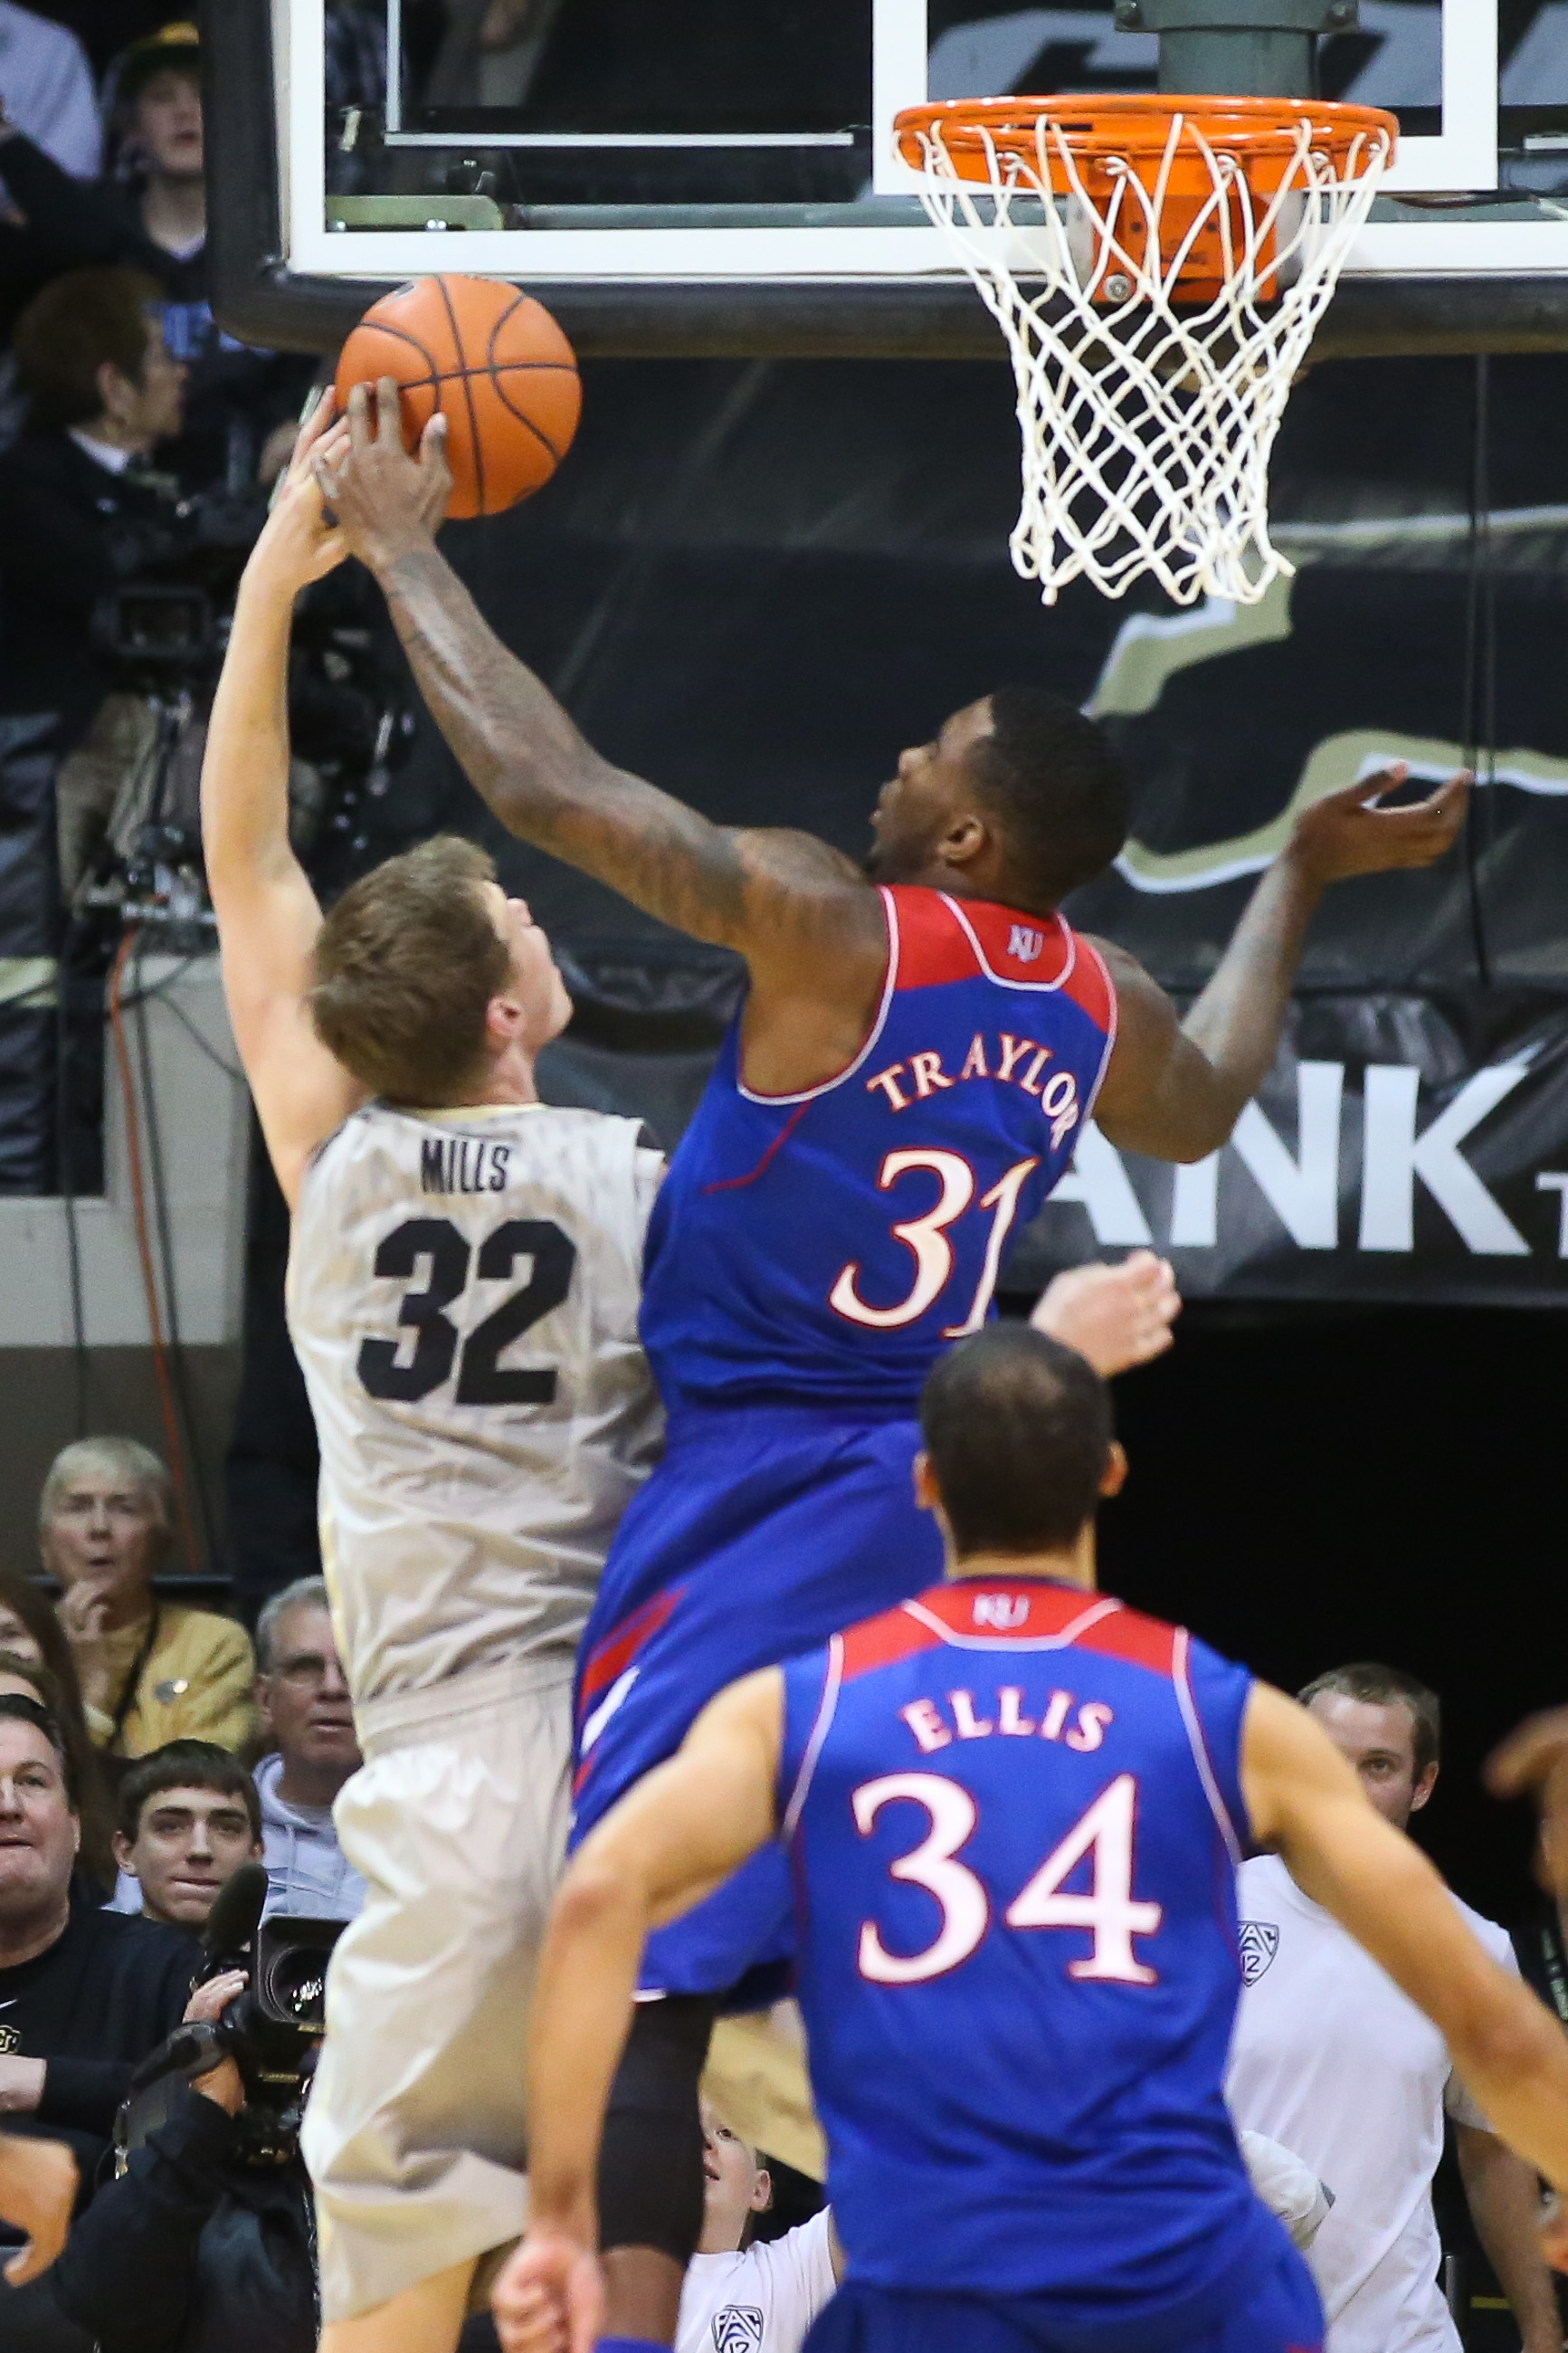 Ku Basketball News